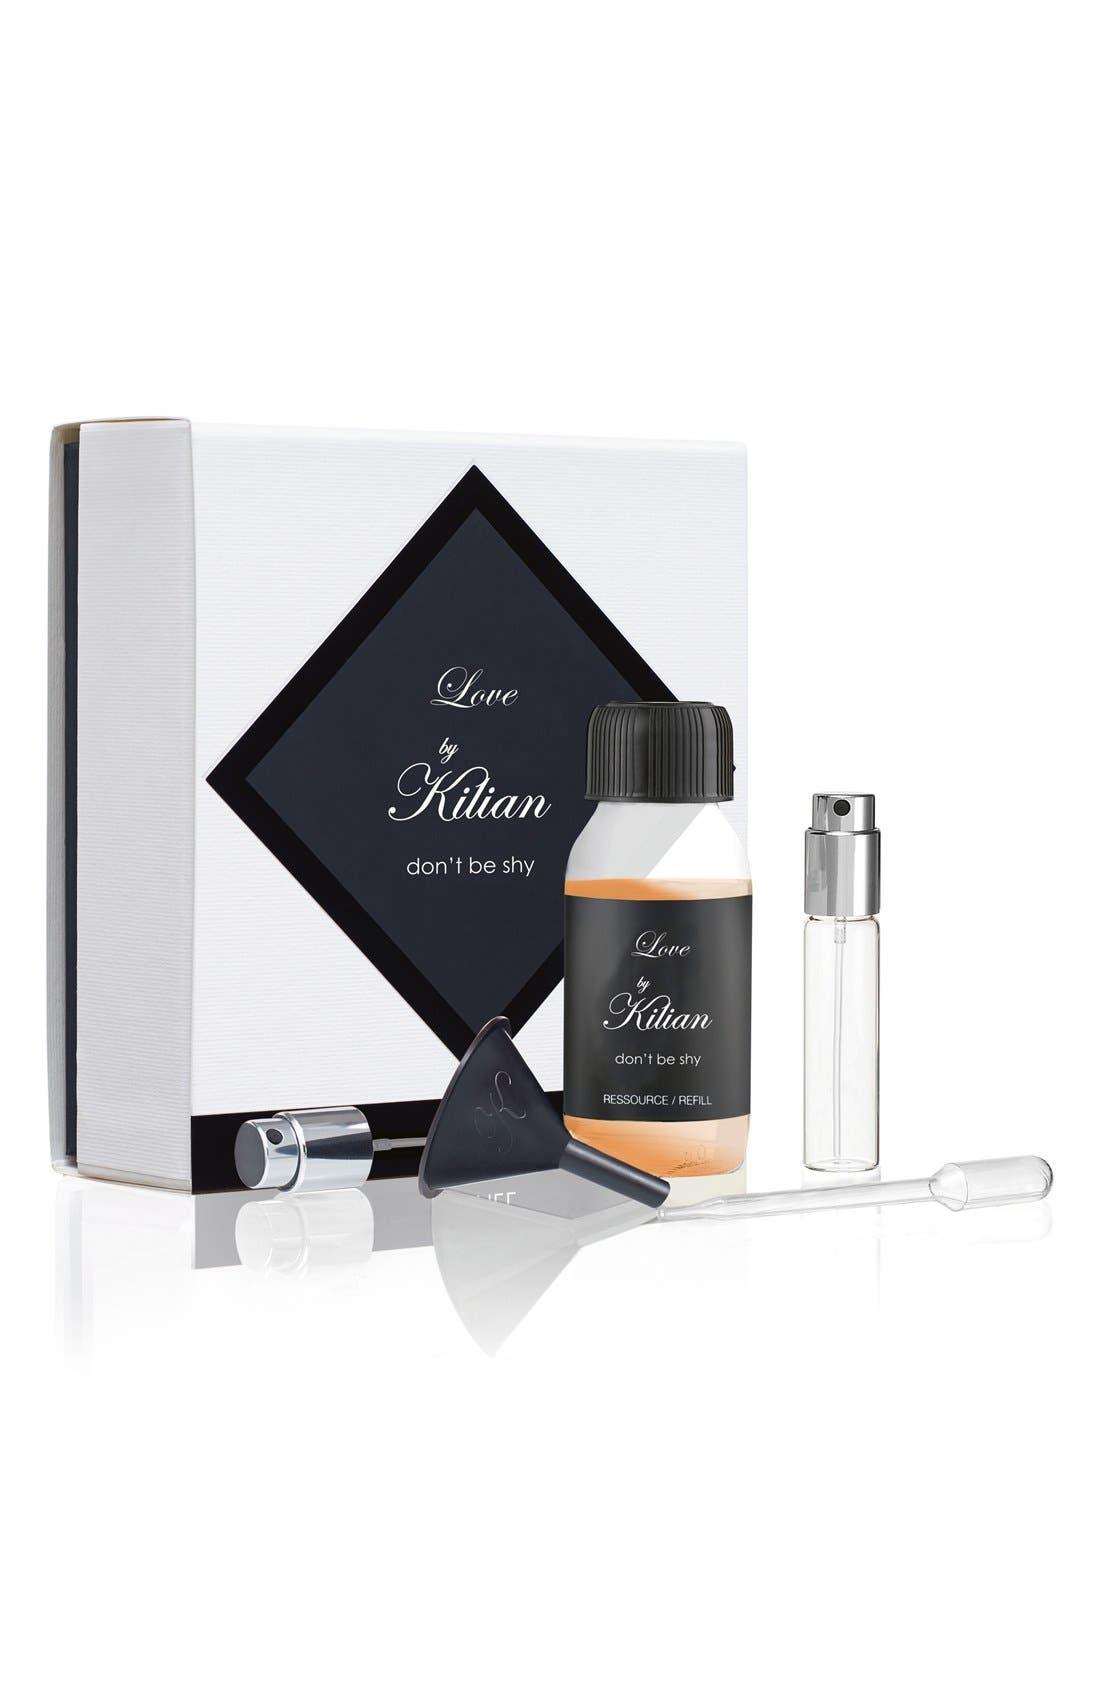 Kilian 'L'Oeuvre Noire - Love, don't be shy' Fragrance Refill Set